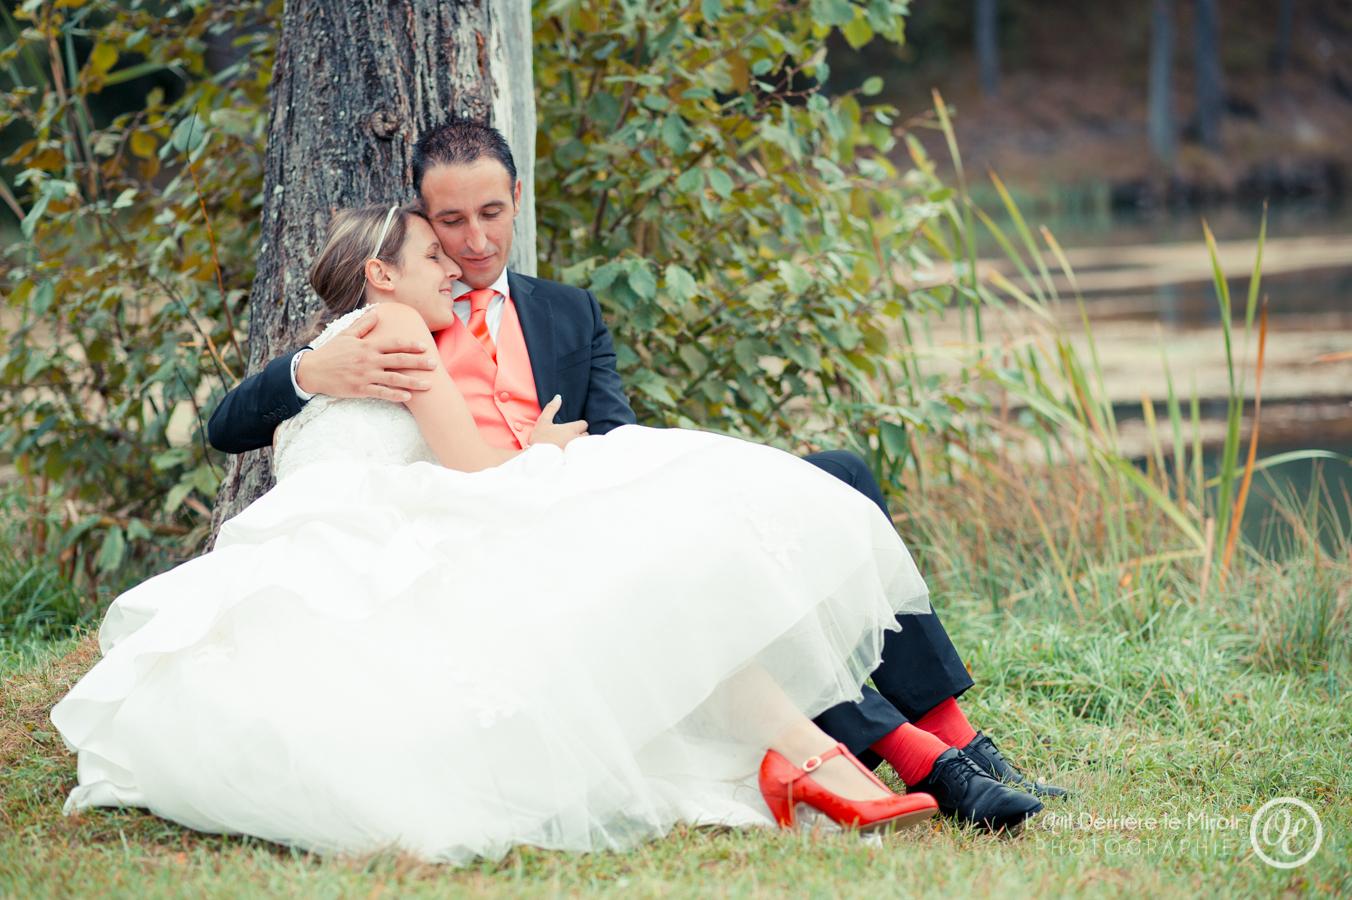 After-wedding-Audrey-Luis-loeilderrierelemiroir-21